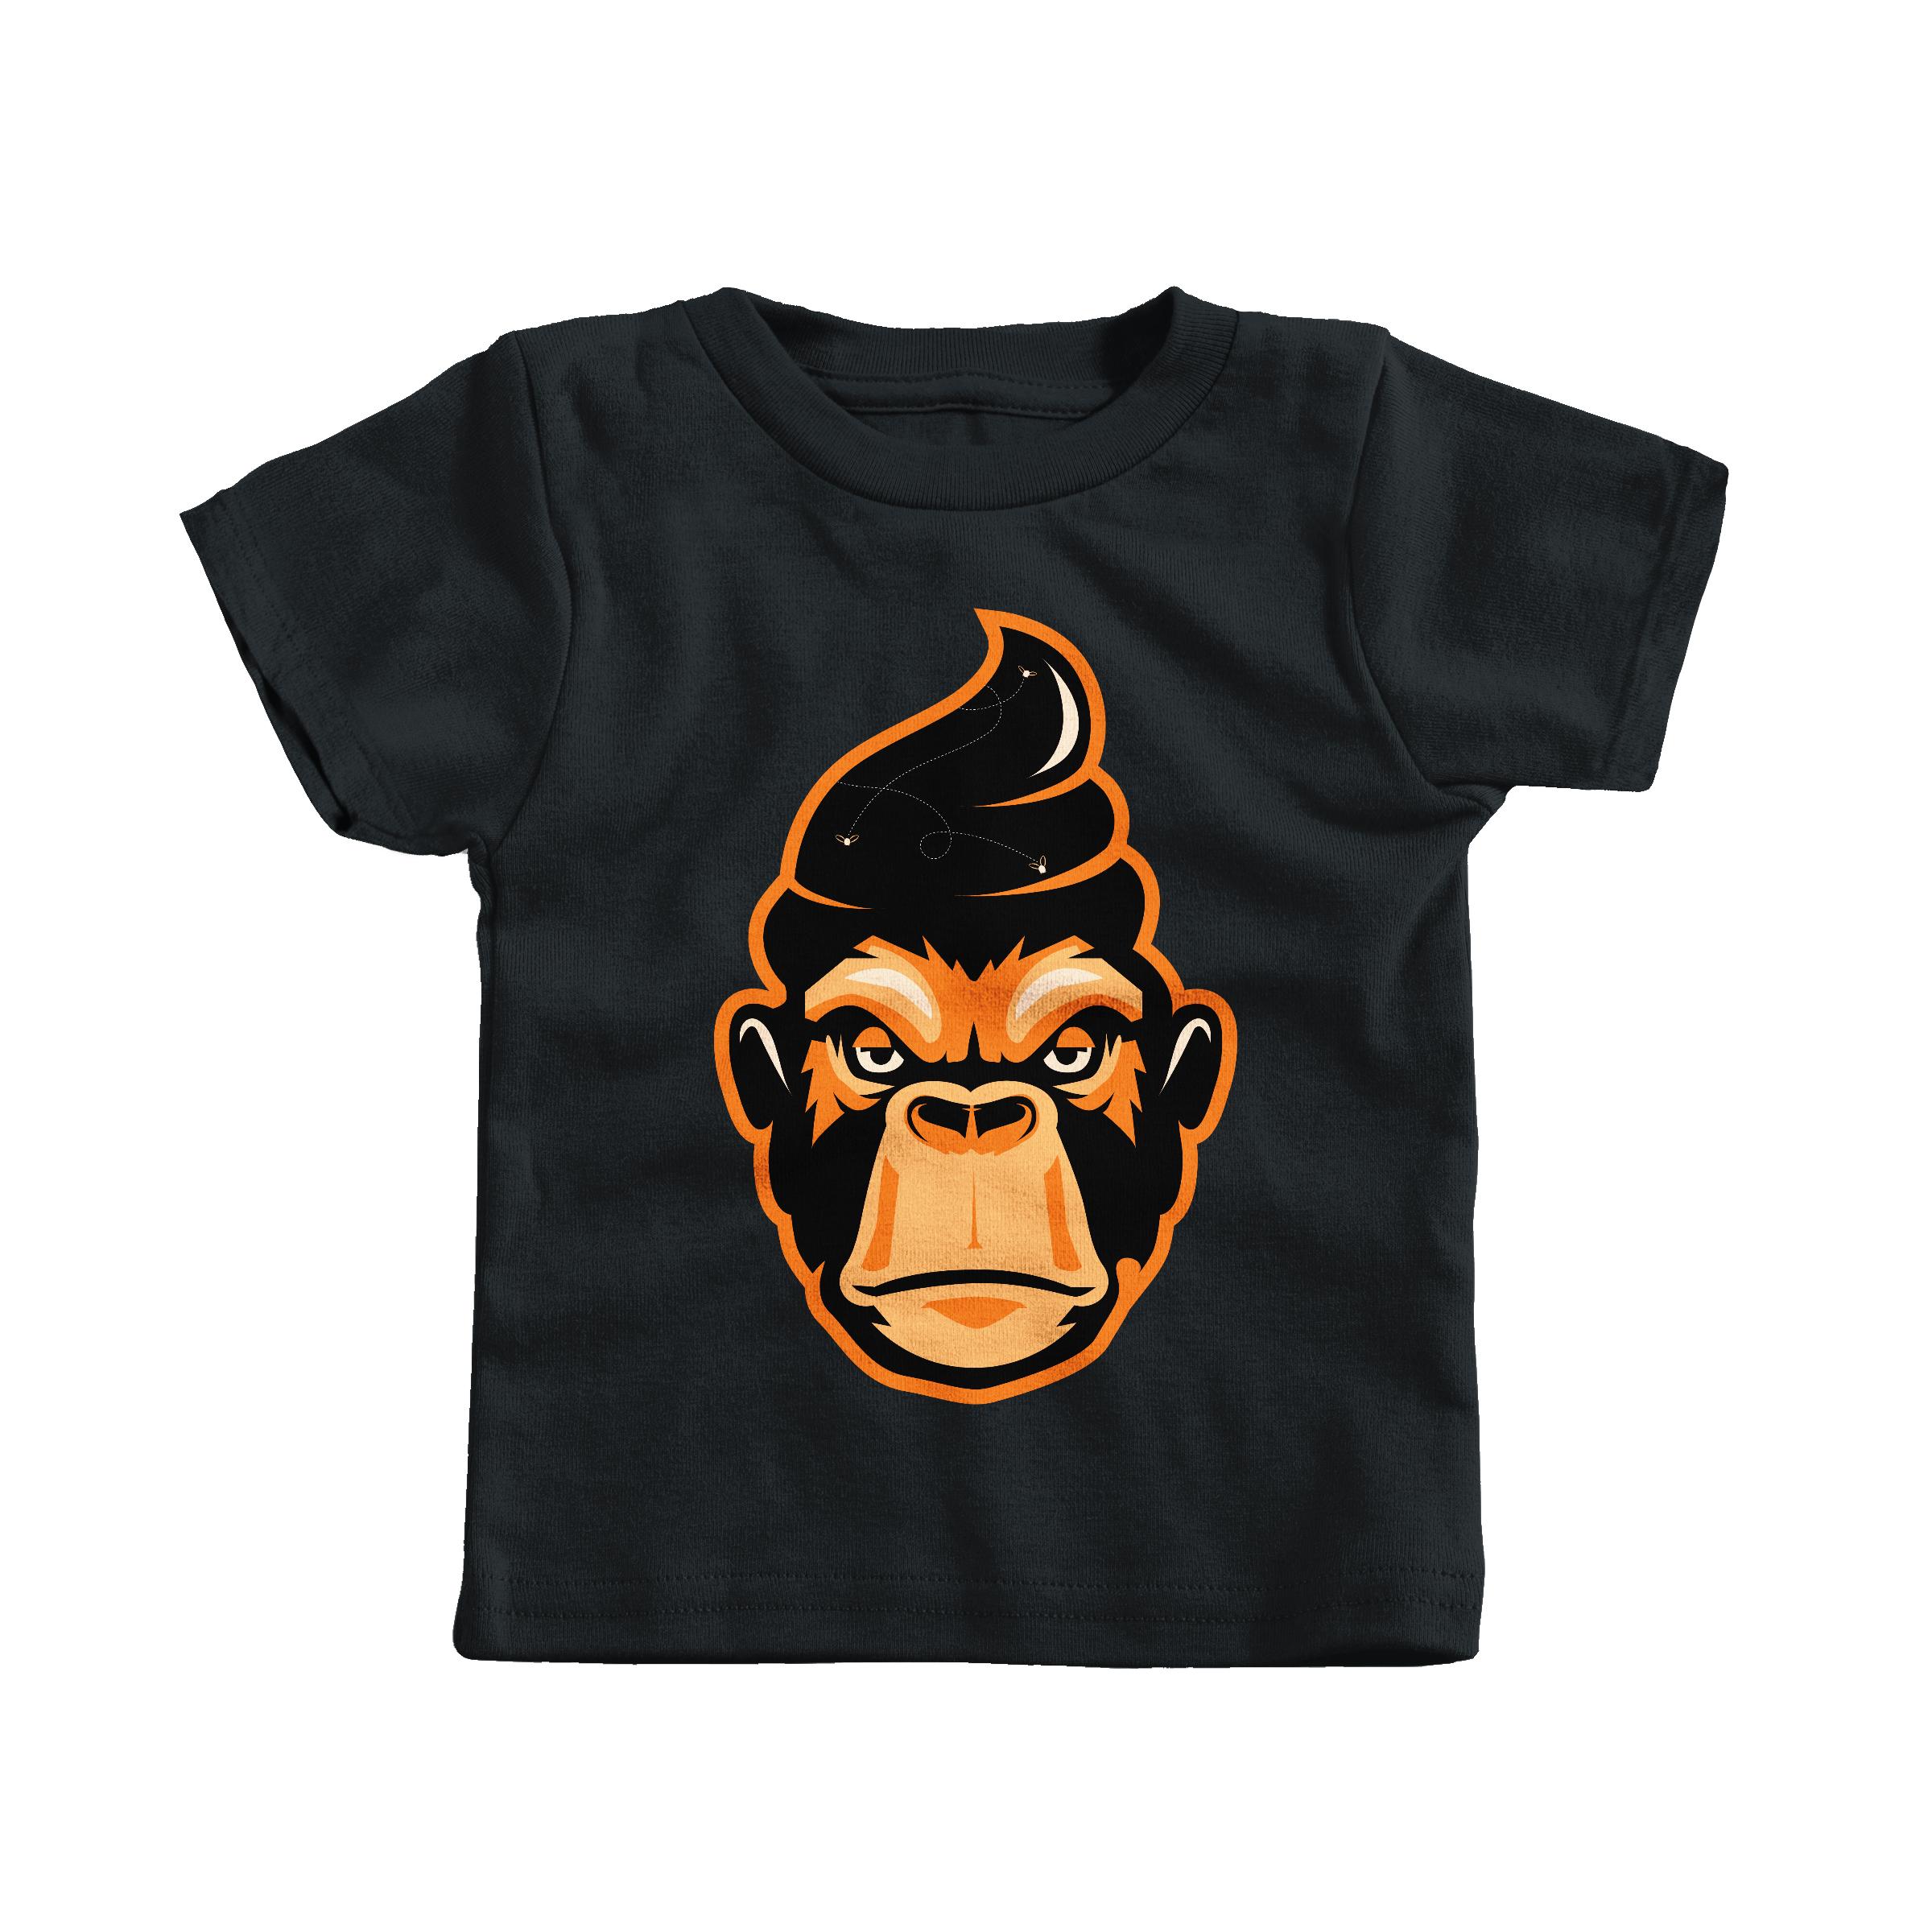 Apesh*t Black (T-Shirt)